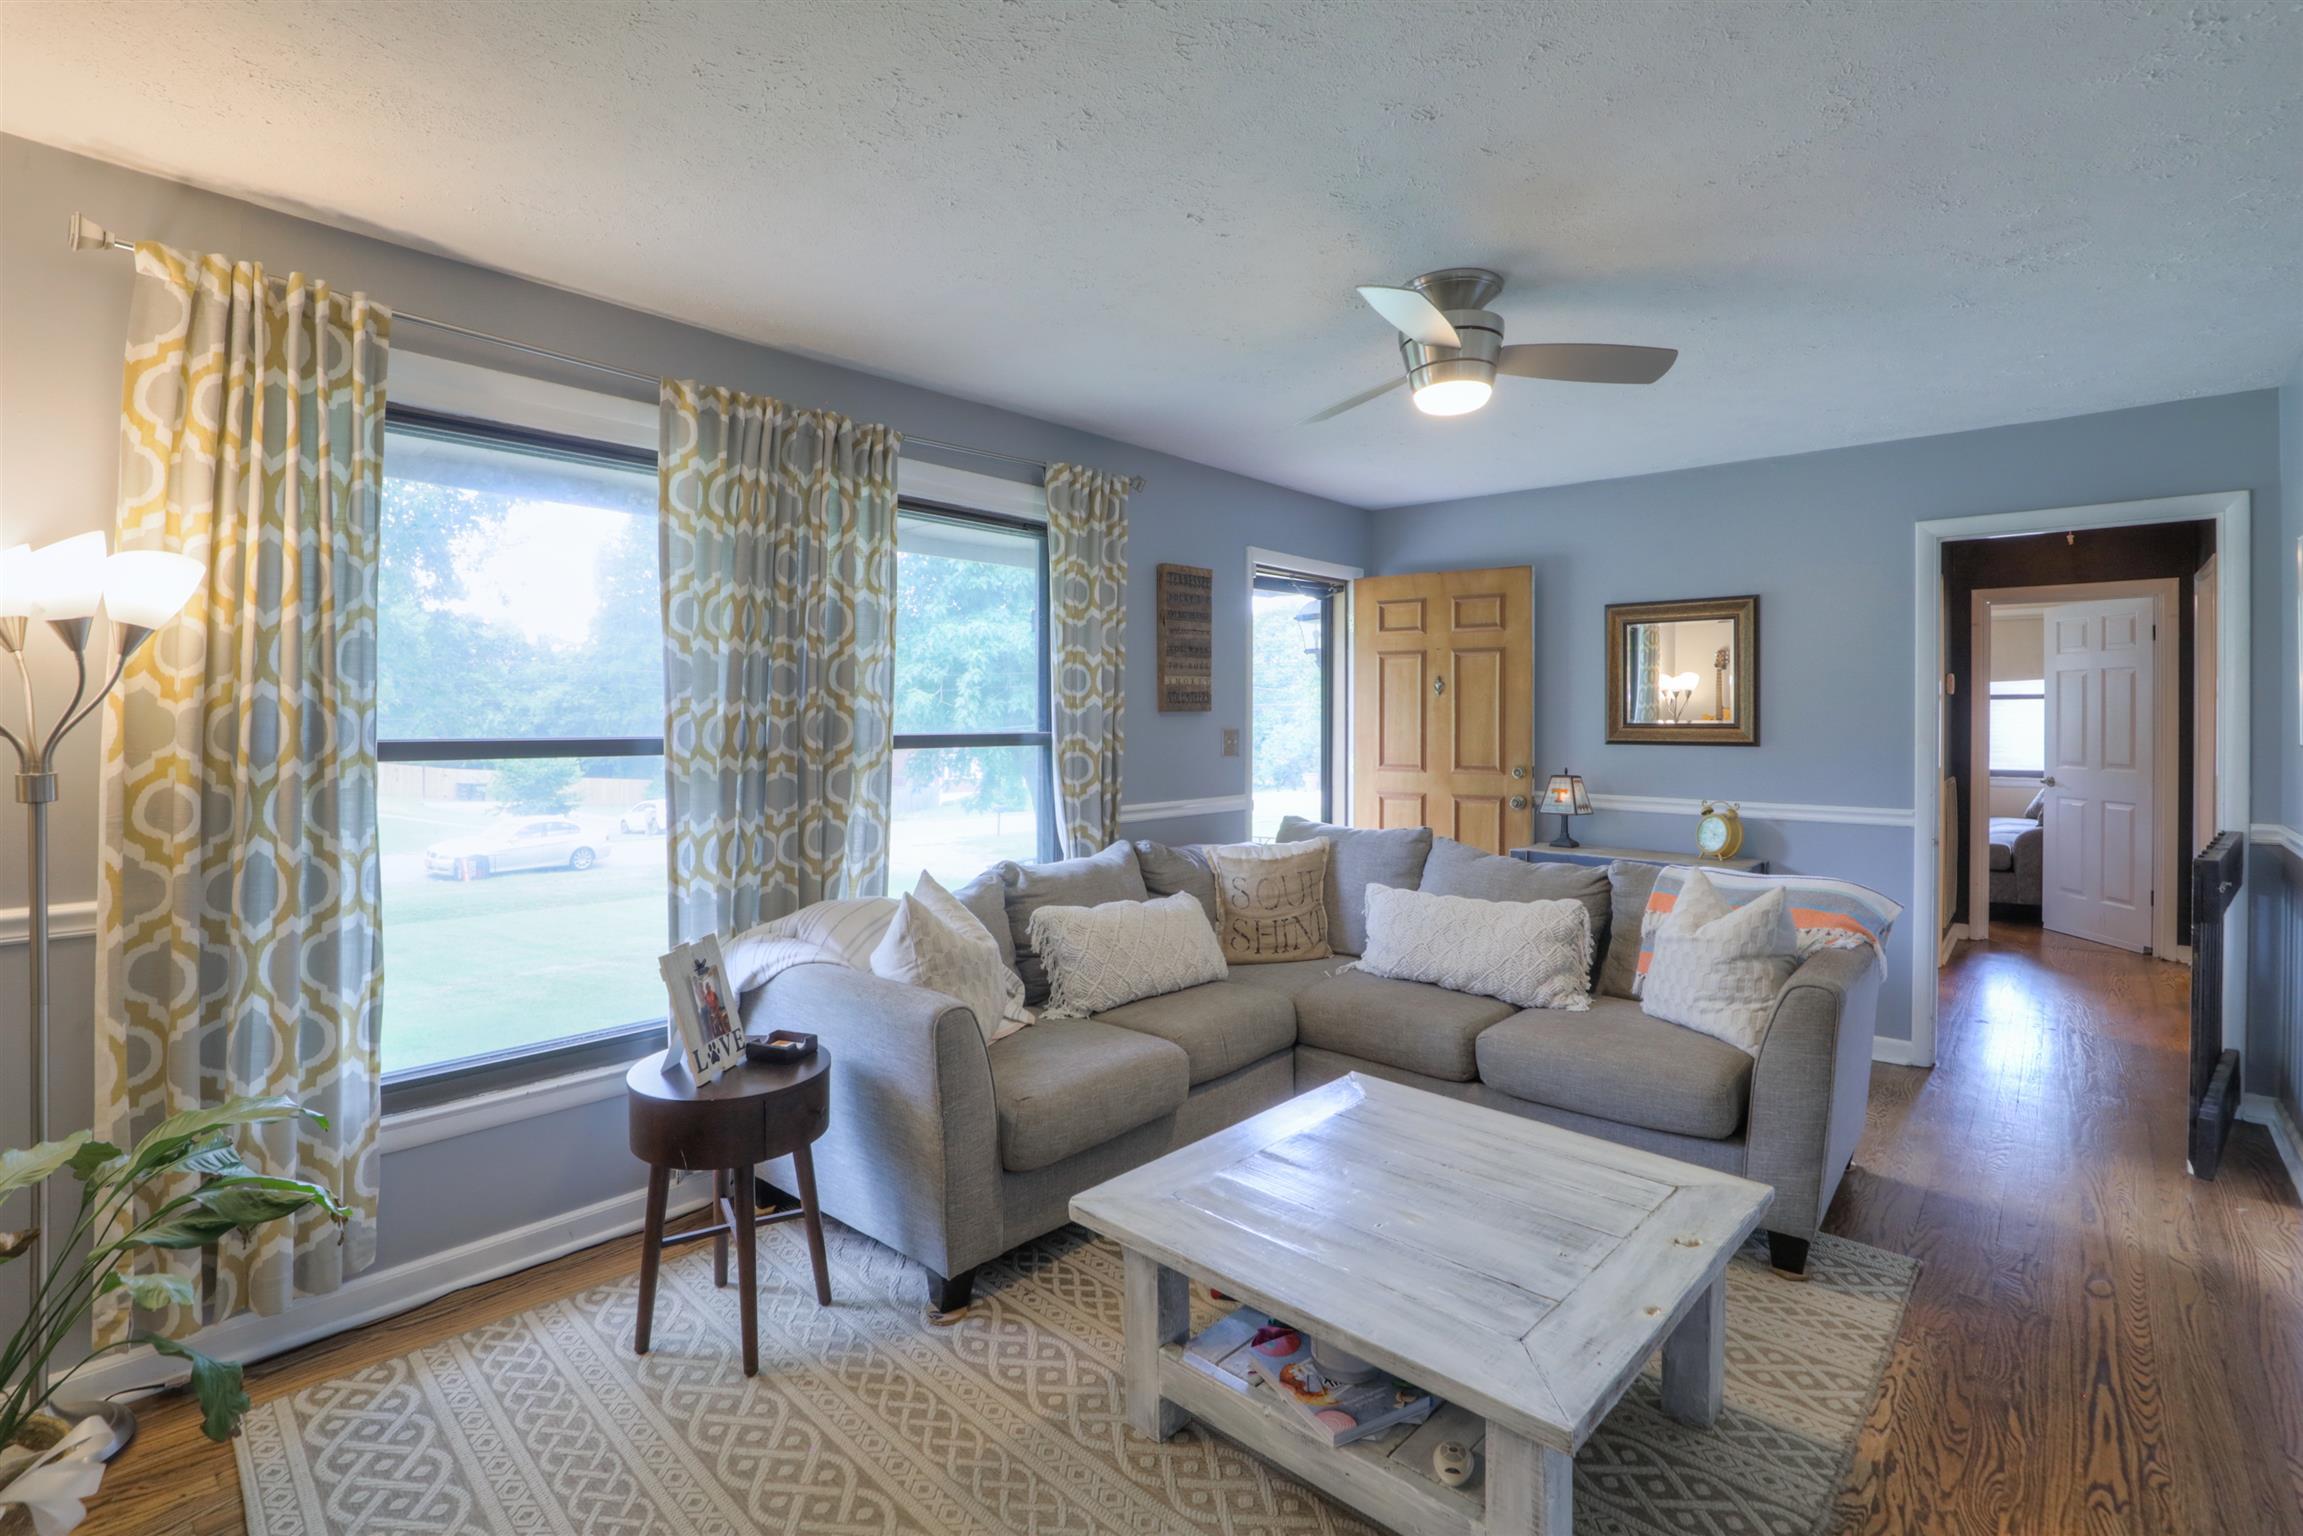 309 Lorna Dr, Nashville, TN 37214 - Nashville, TN real estate listing